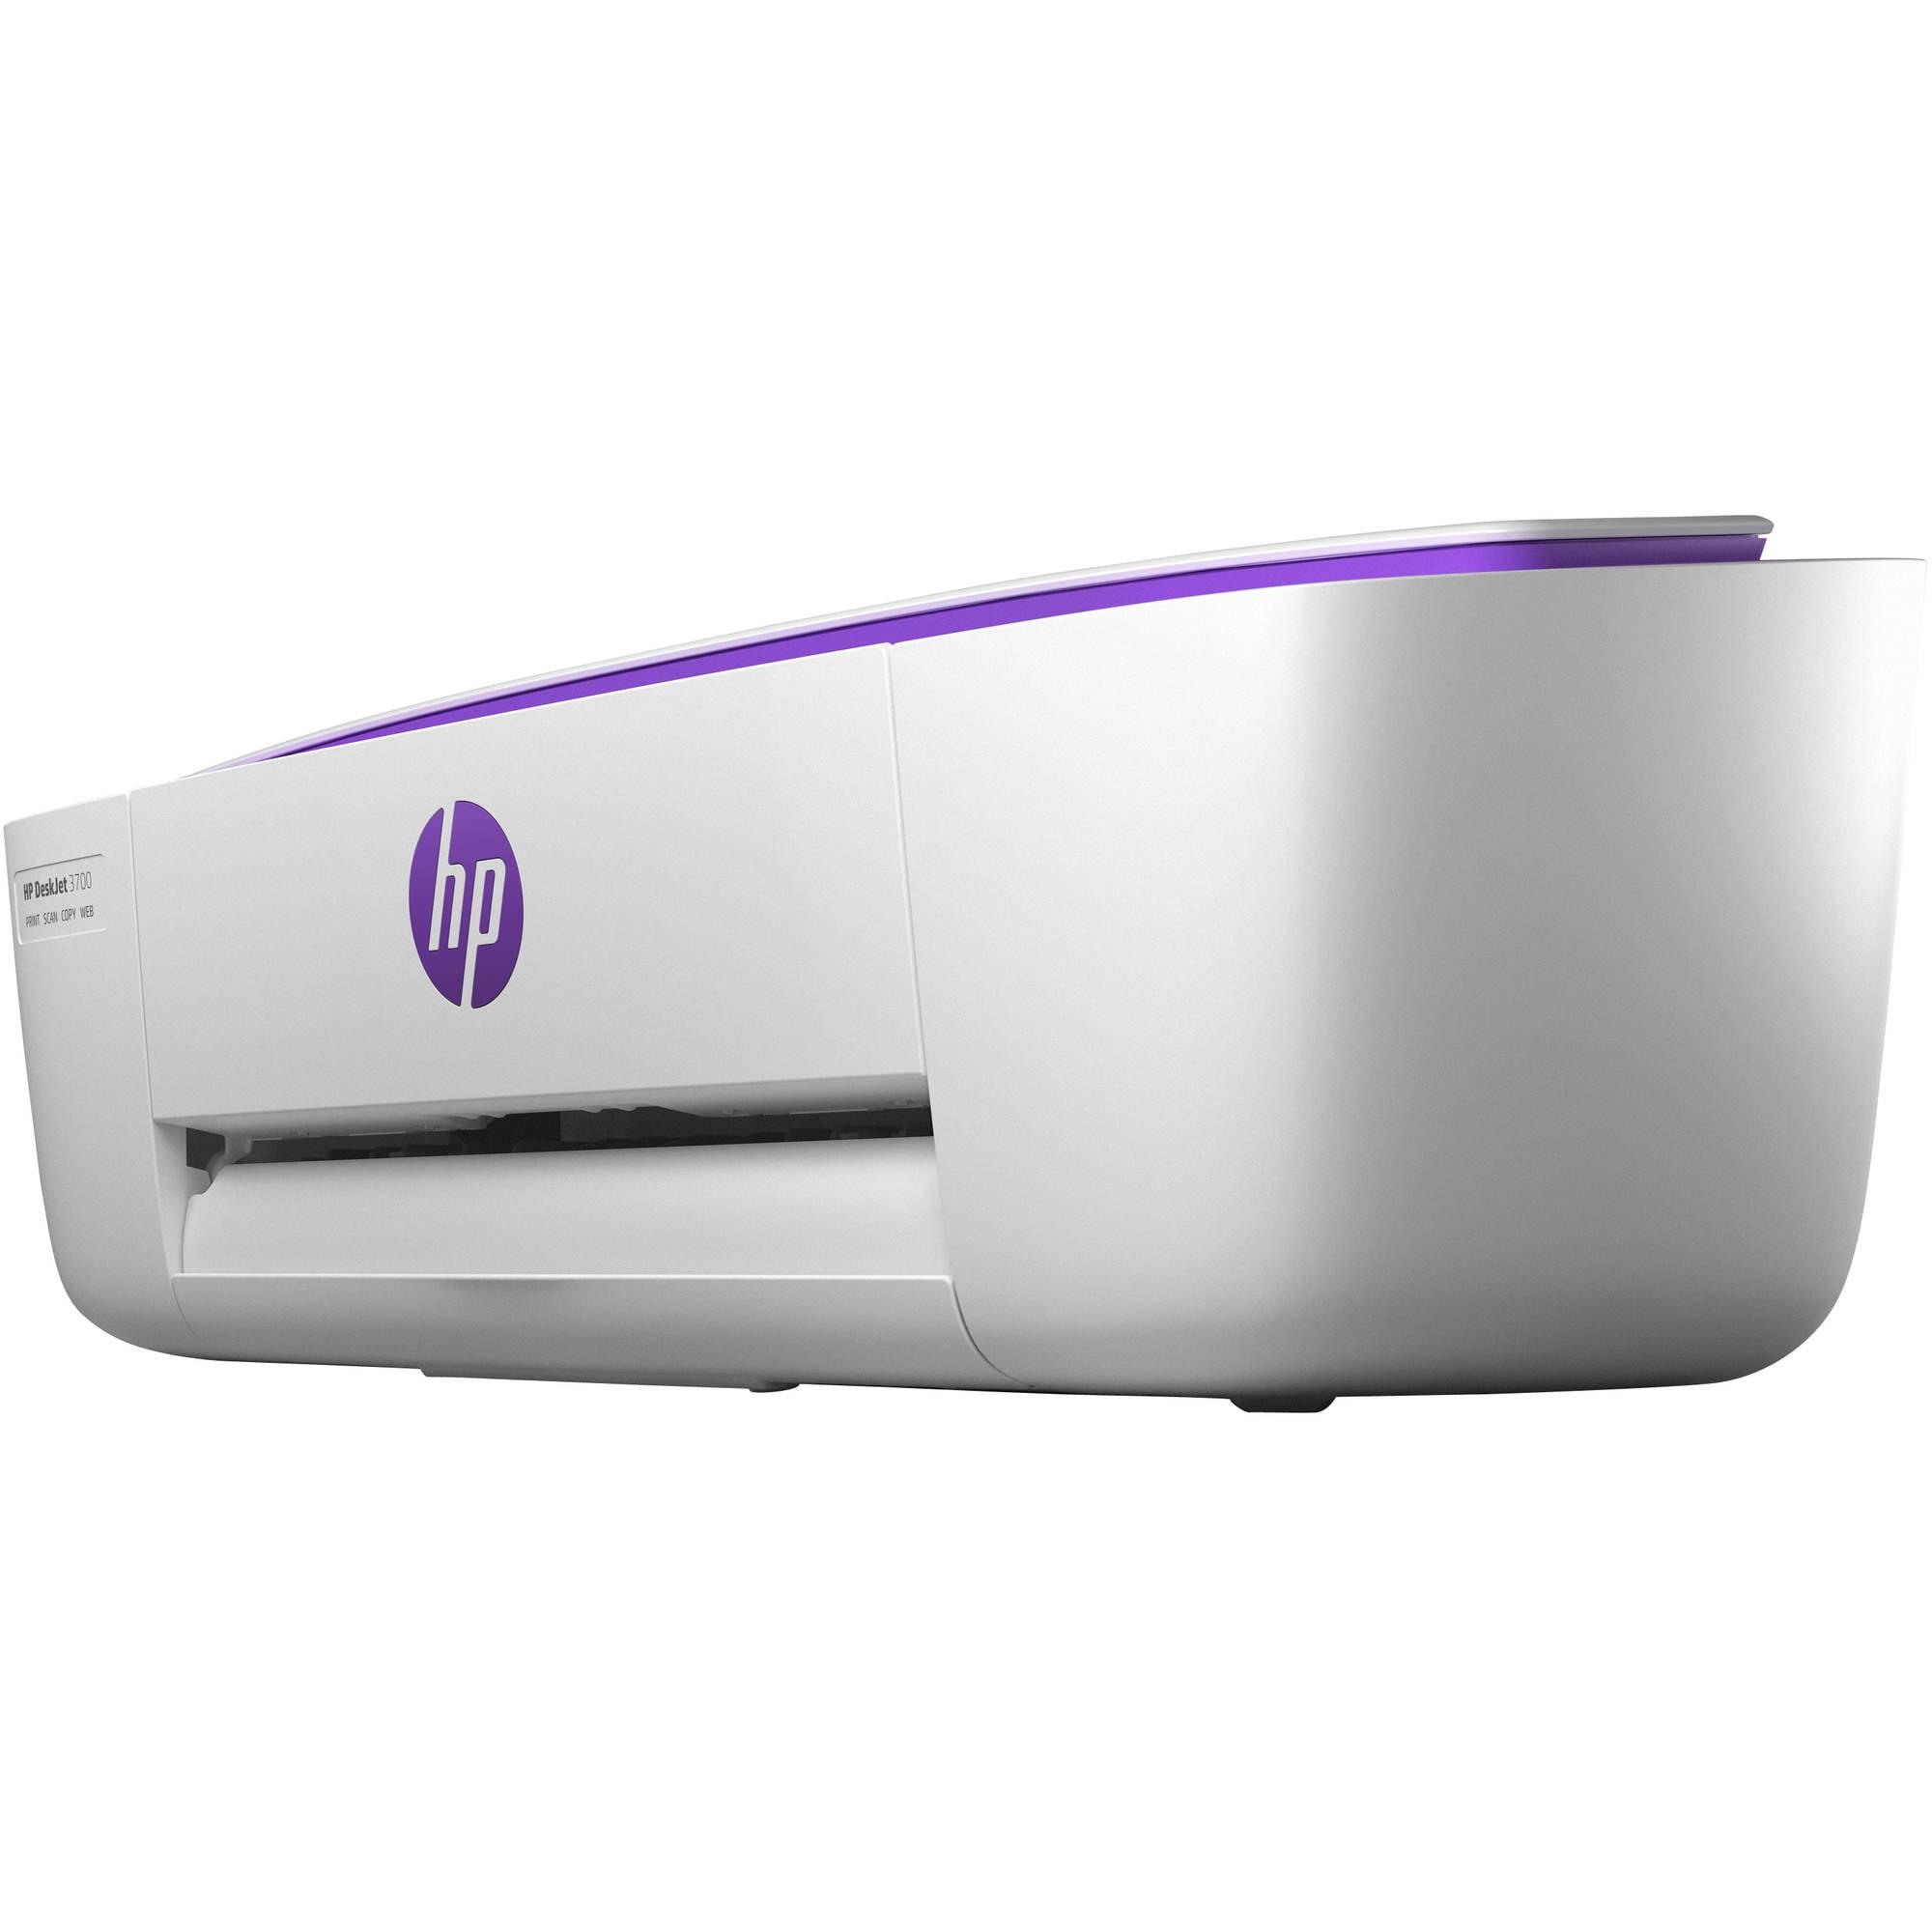 HP DeskJet 3752 All-in-One Multifunction Printer/Copier/Scanner